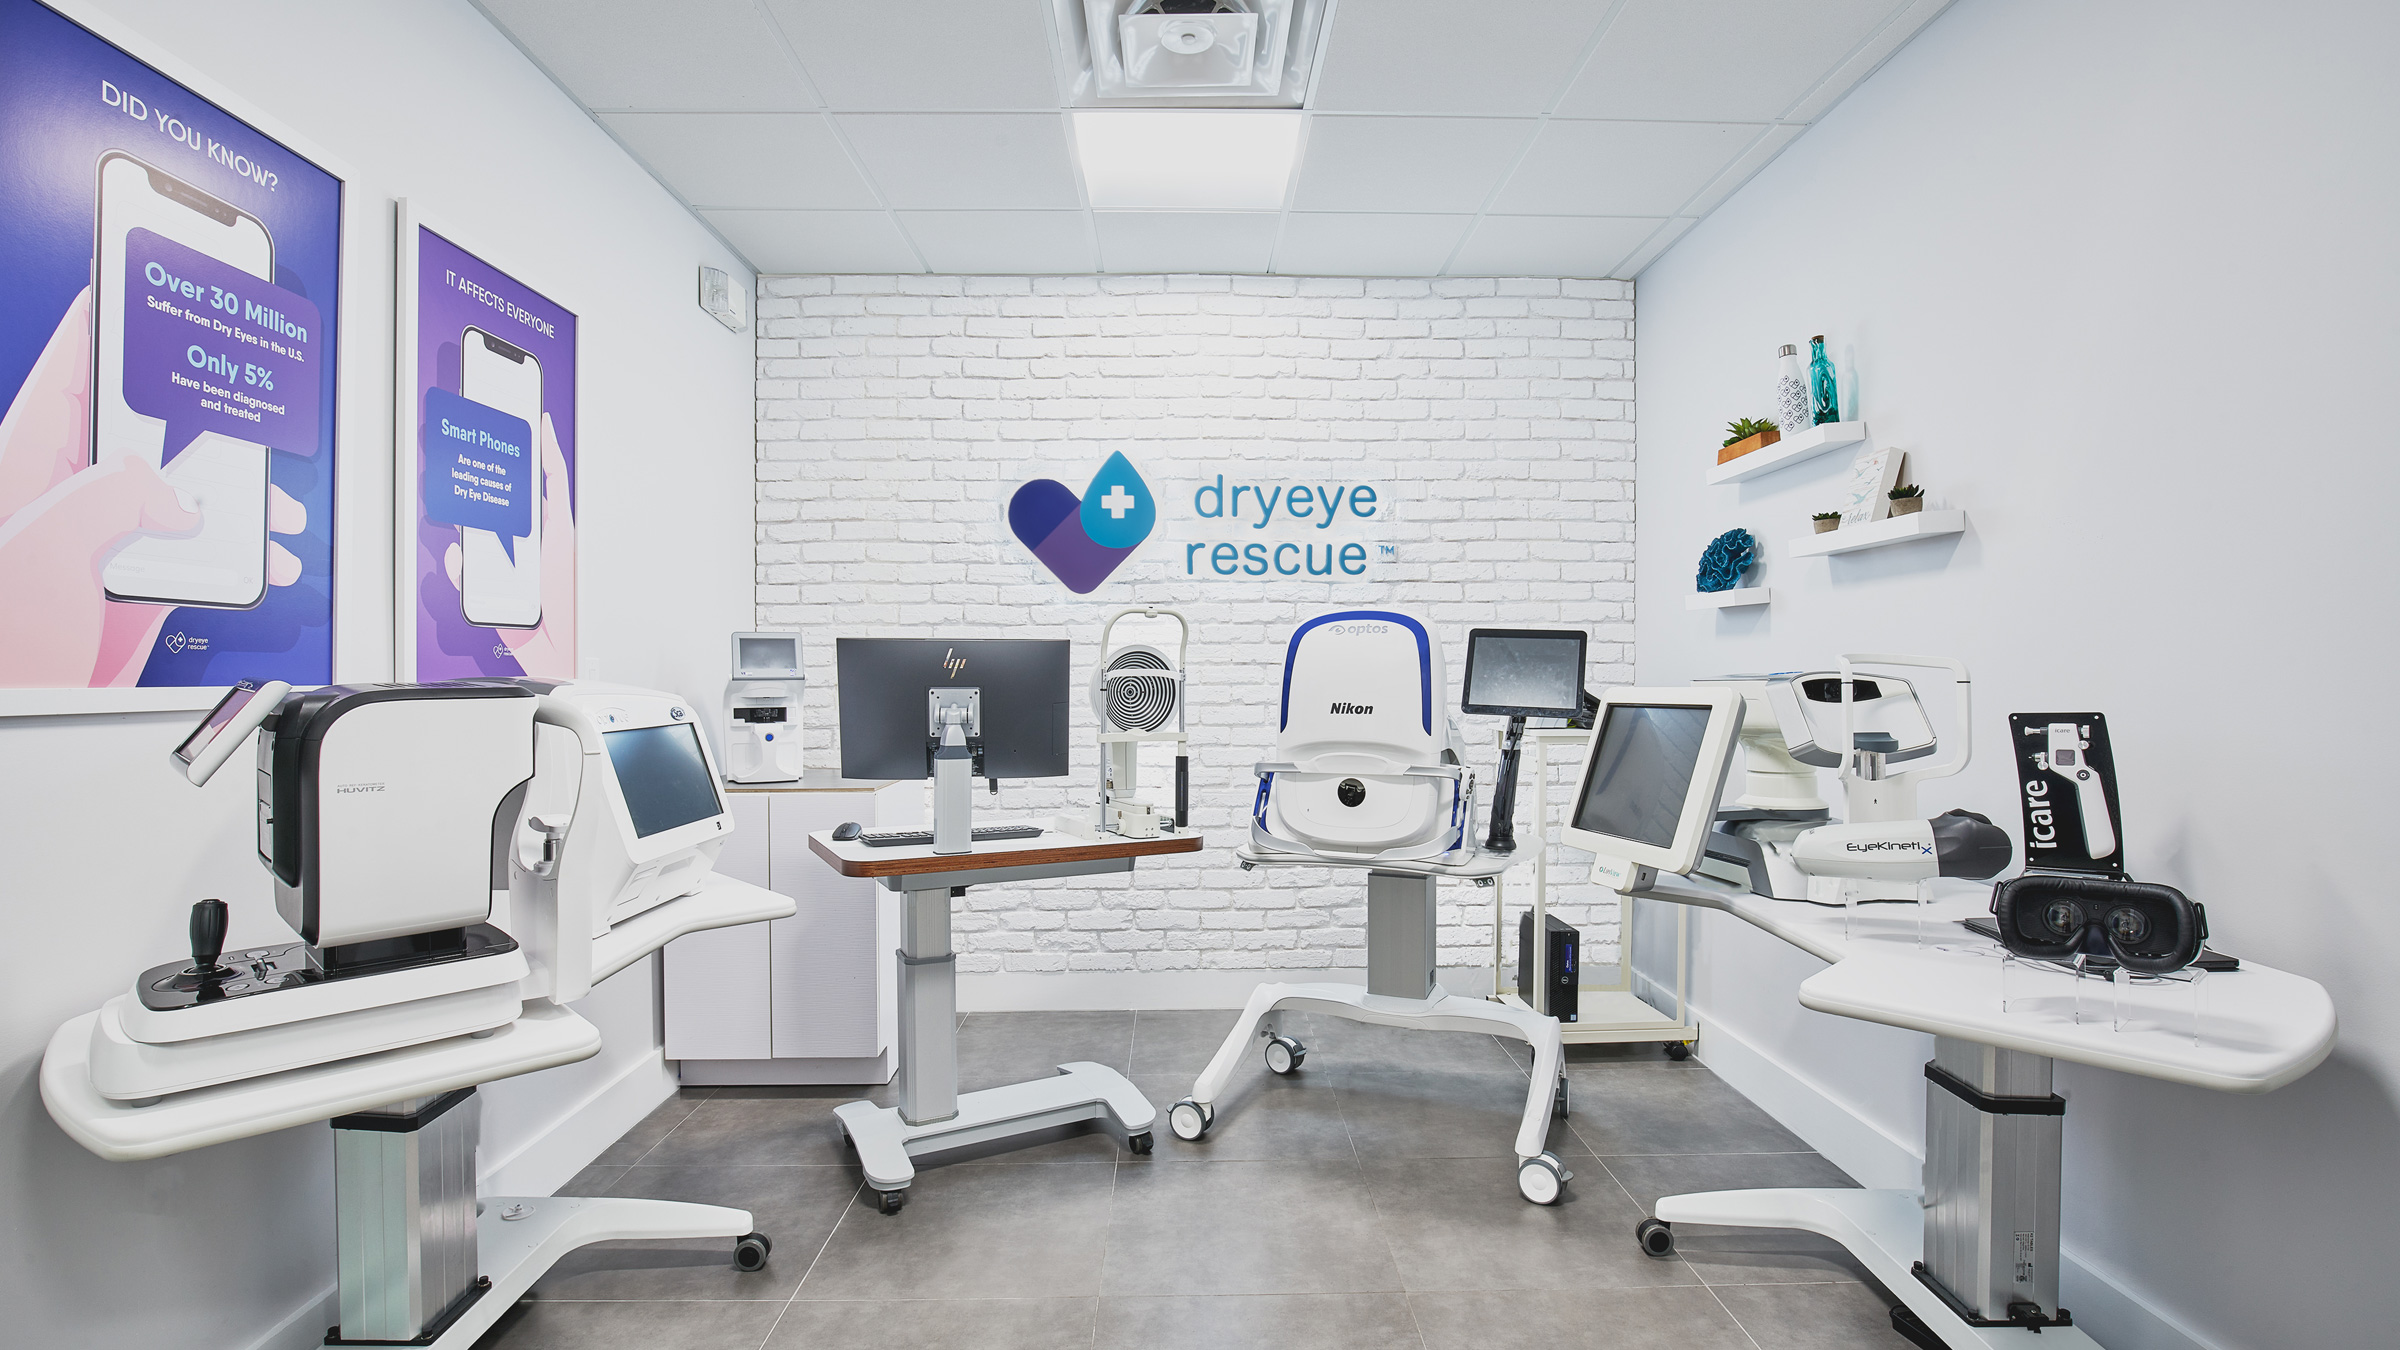 pretest room dryeye rescue bv 02